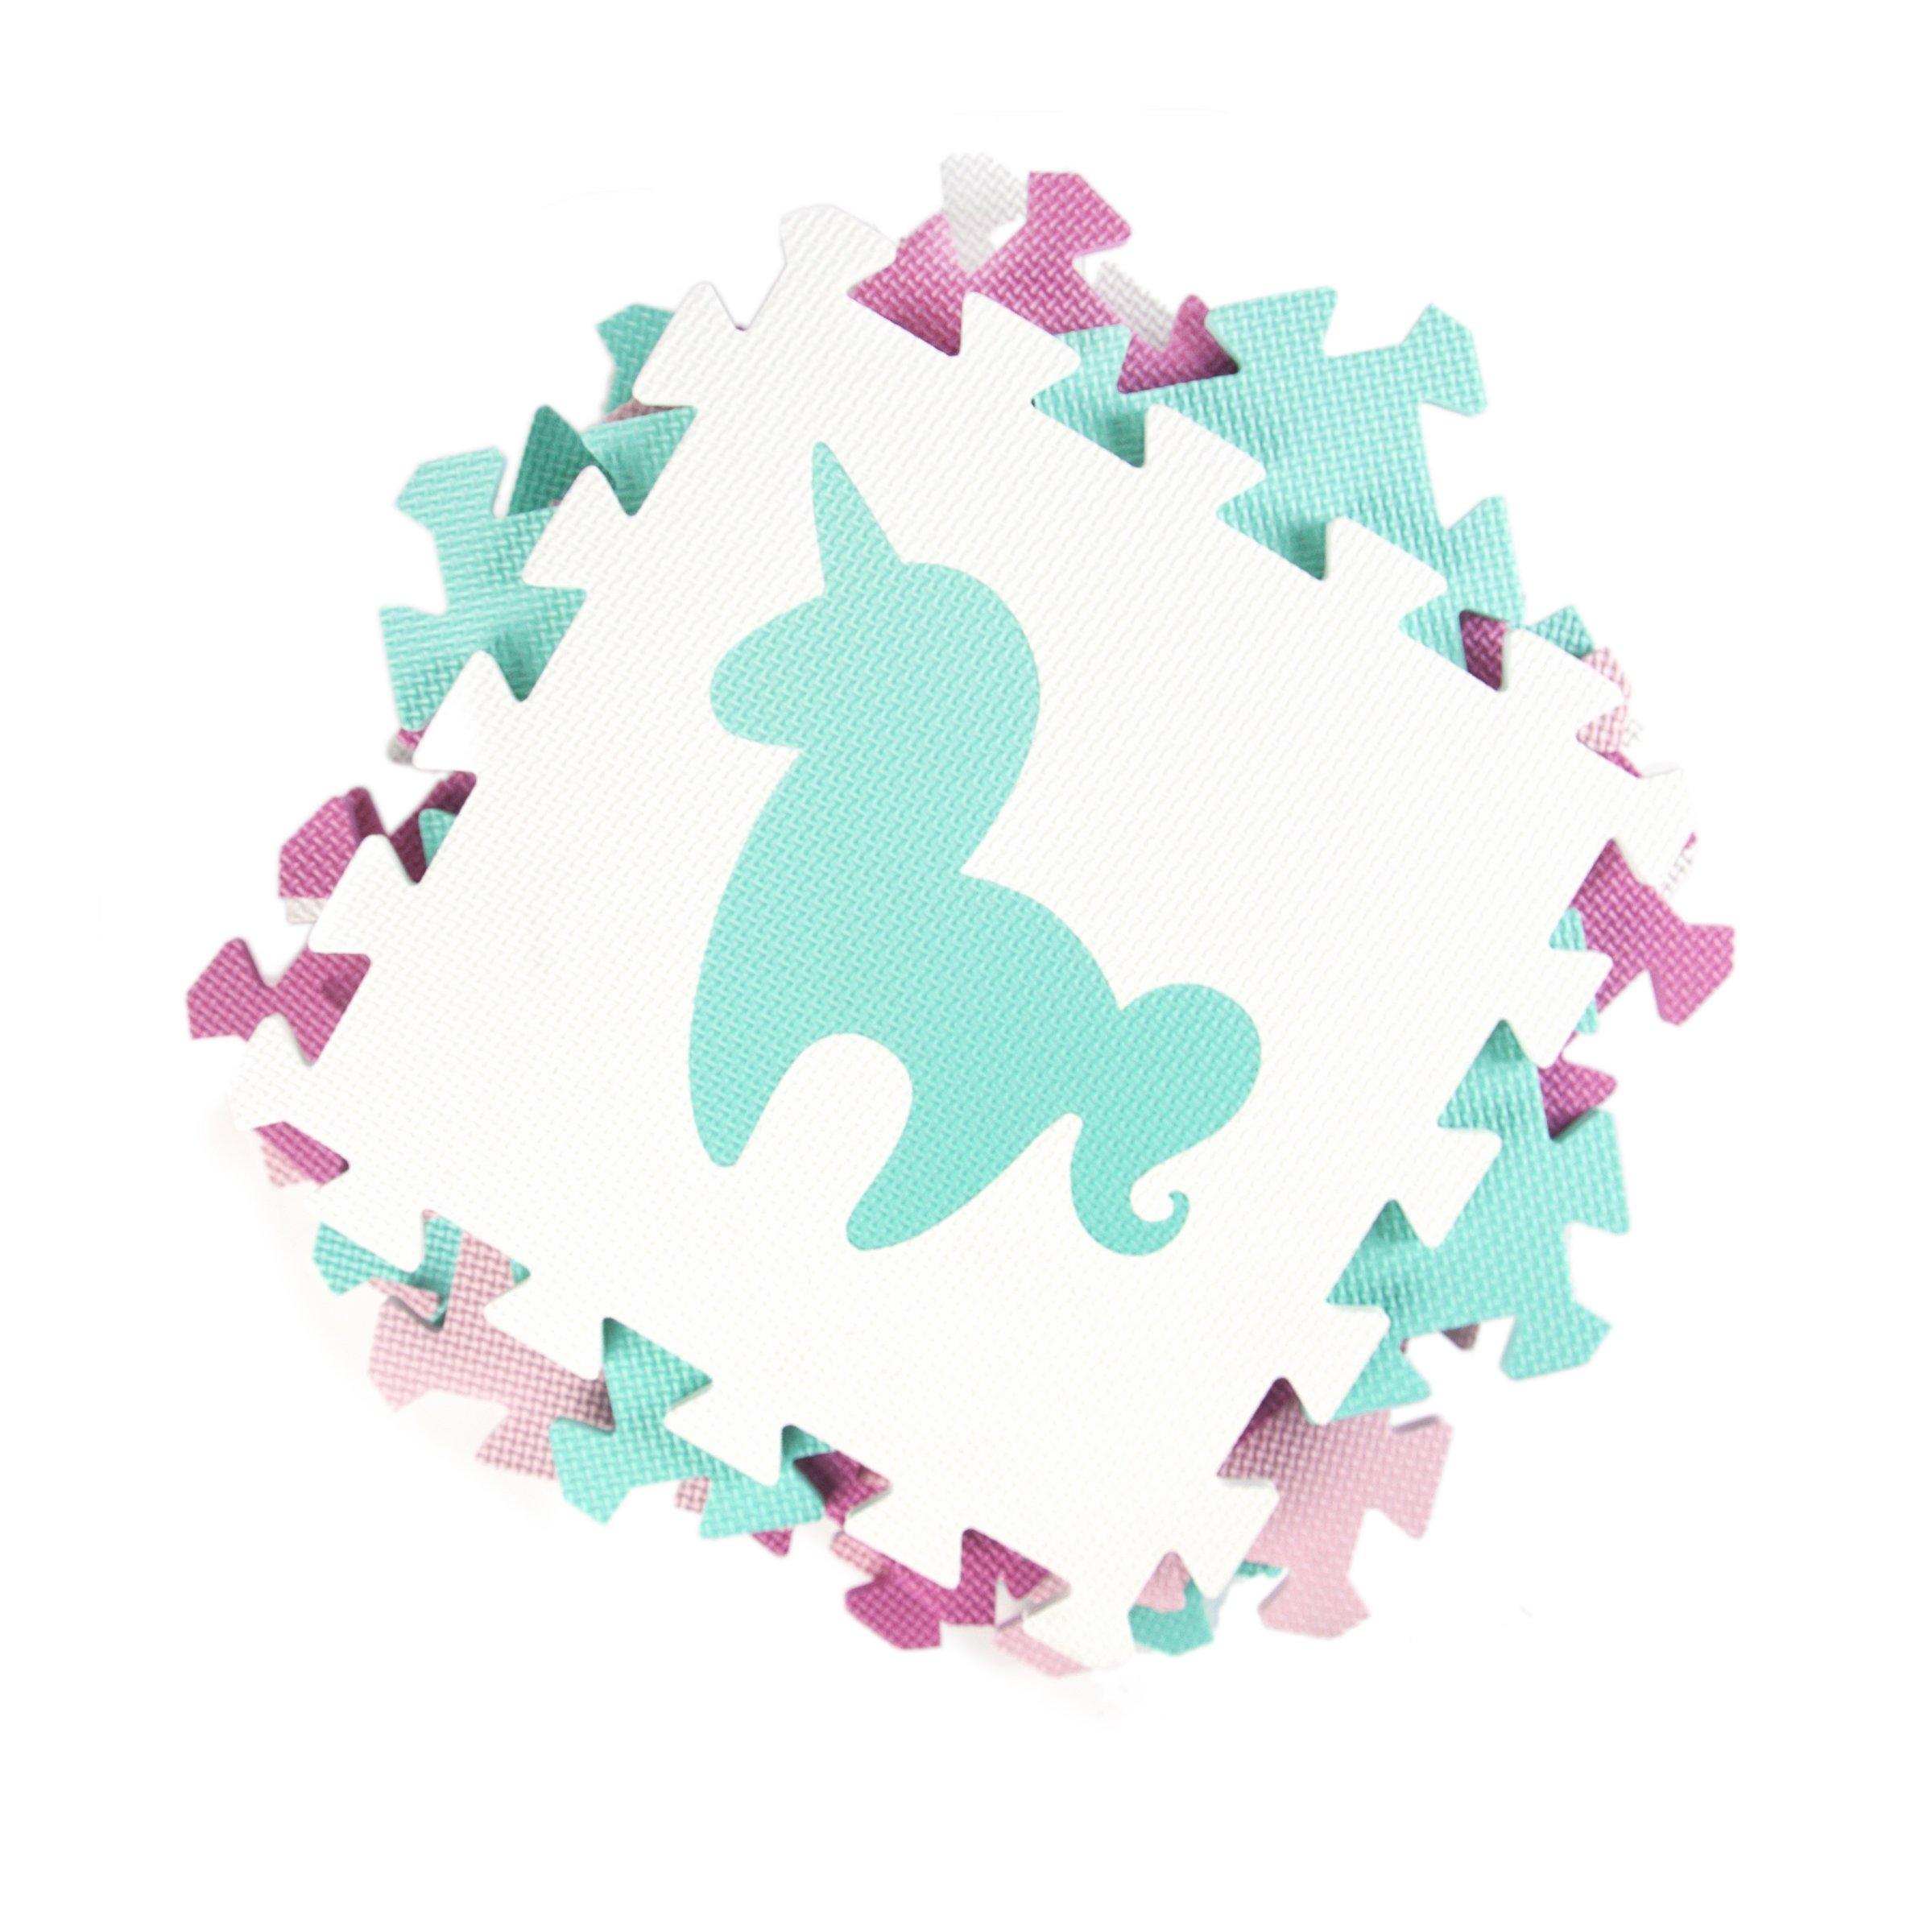 Tadpoles Soft EVA Foam 16pc Playmat Set, Unicorns and Rainbows, Pink, 50''x50'' by Tadpoles (Image #3)